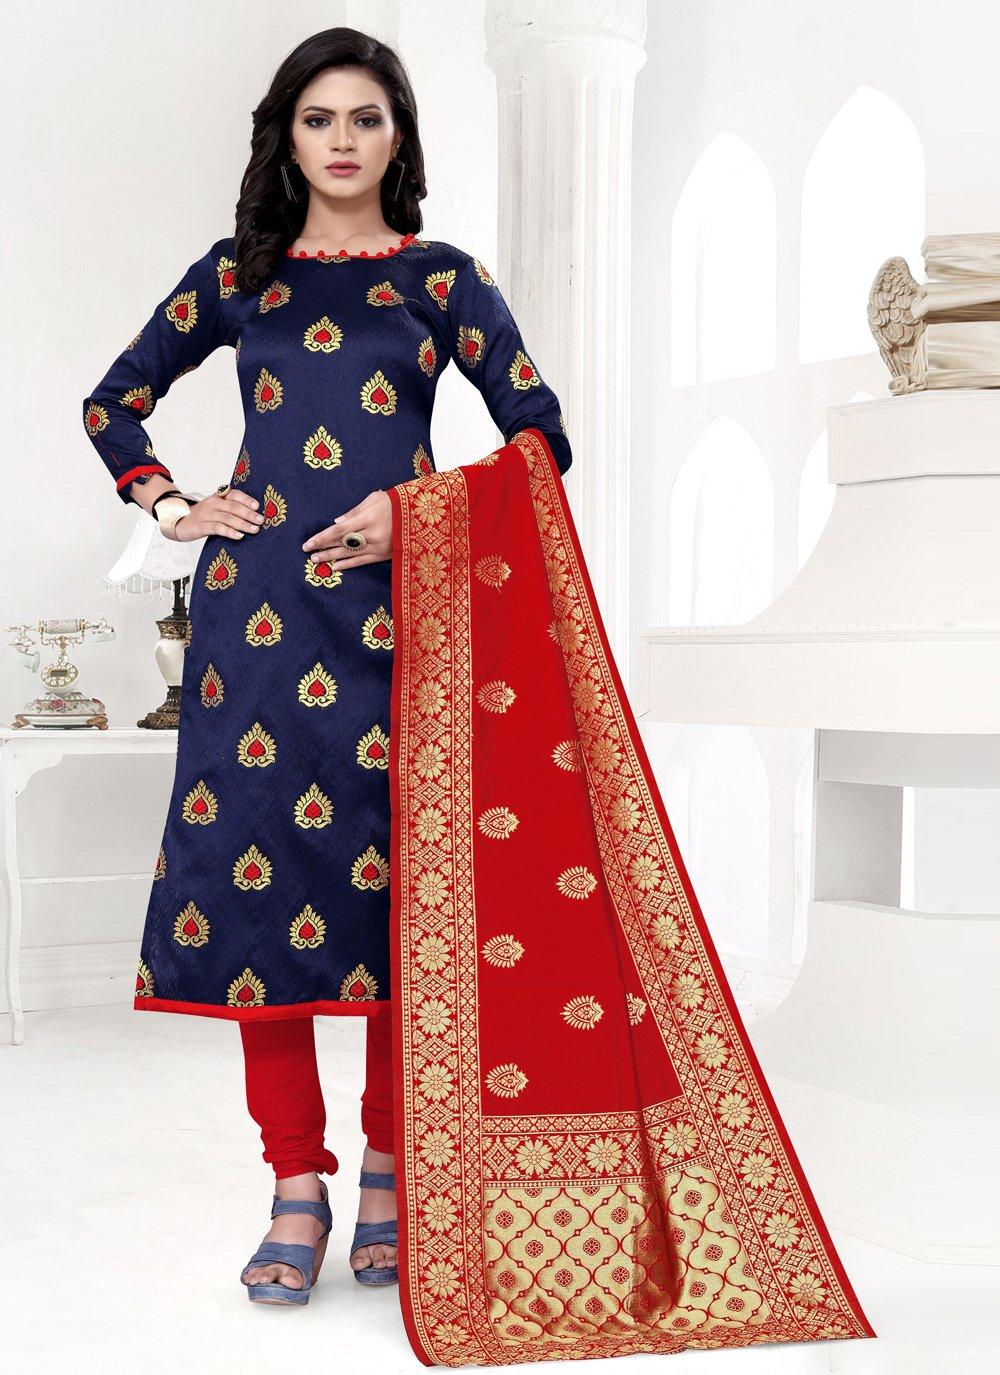 Churidar Suit For Festival